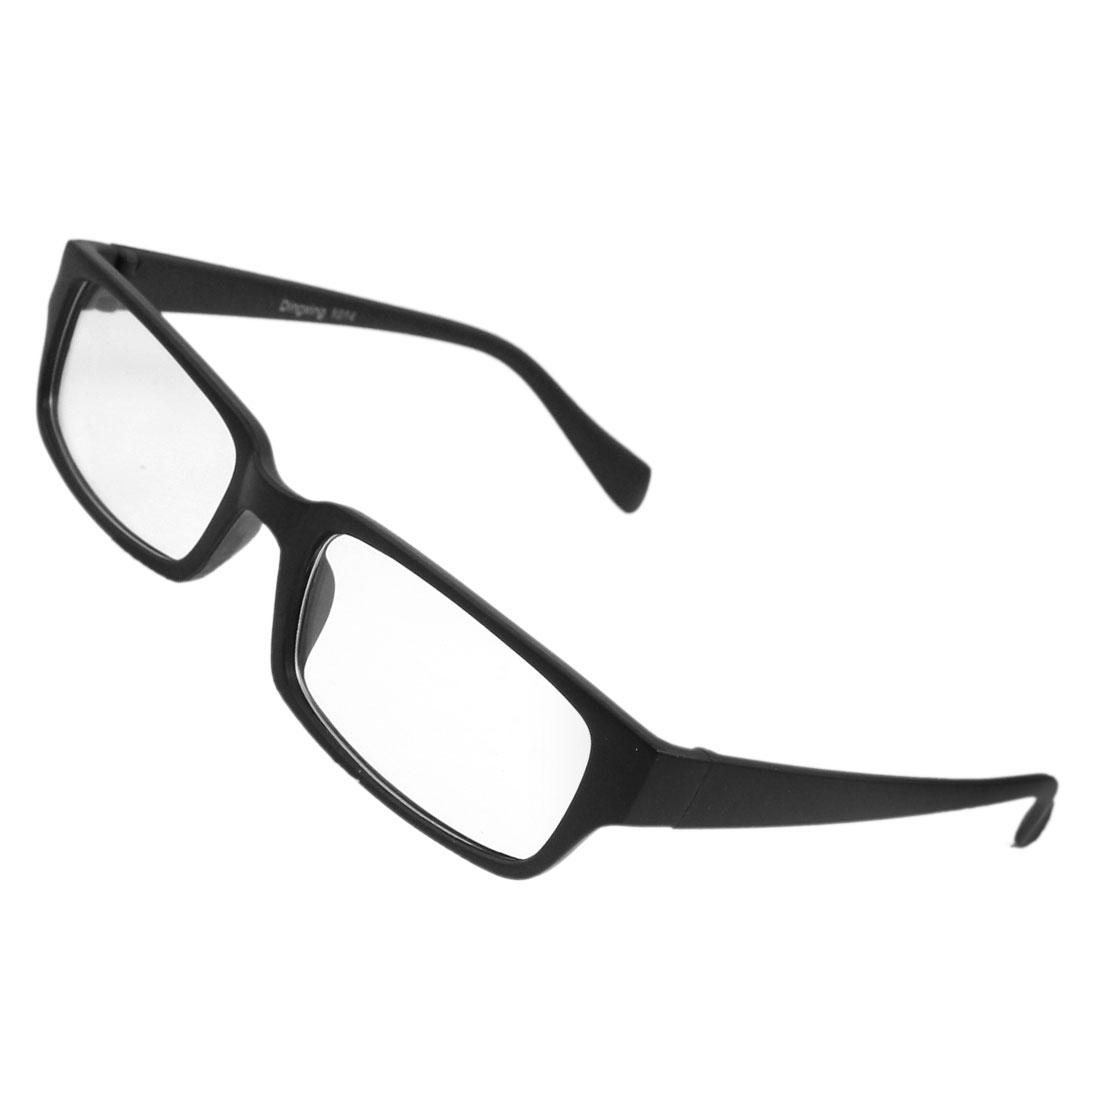 Lady Man Plastic Frame Rectangle Shaped Clear Lens Plain Plano Glasses Black